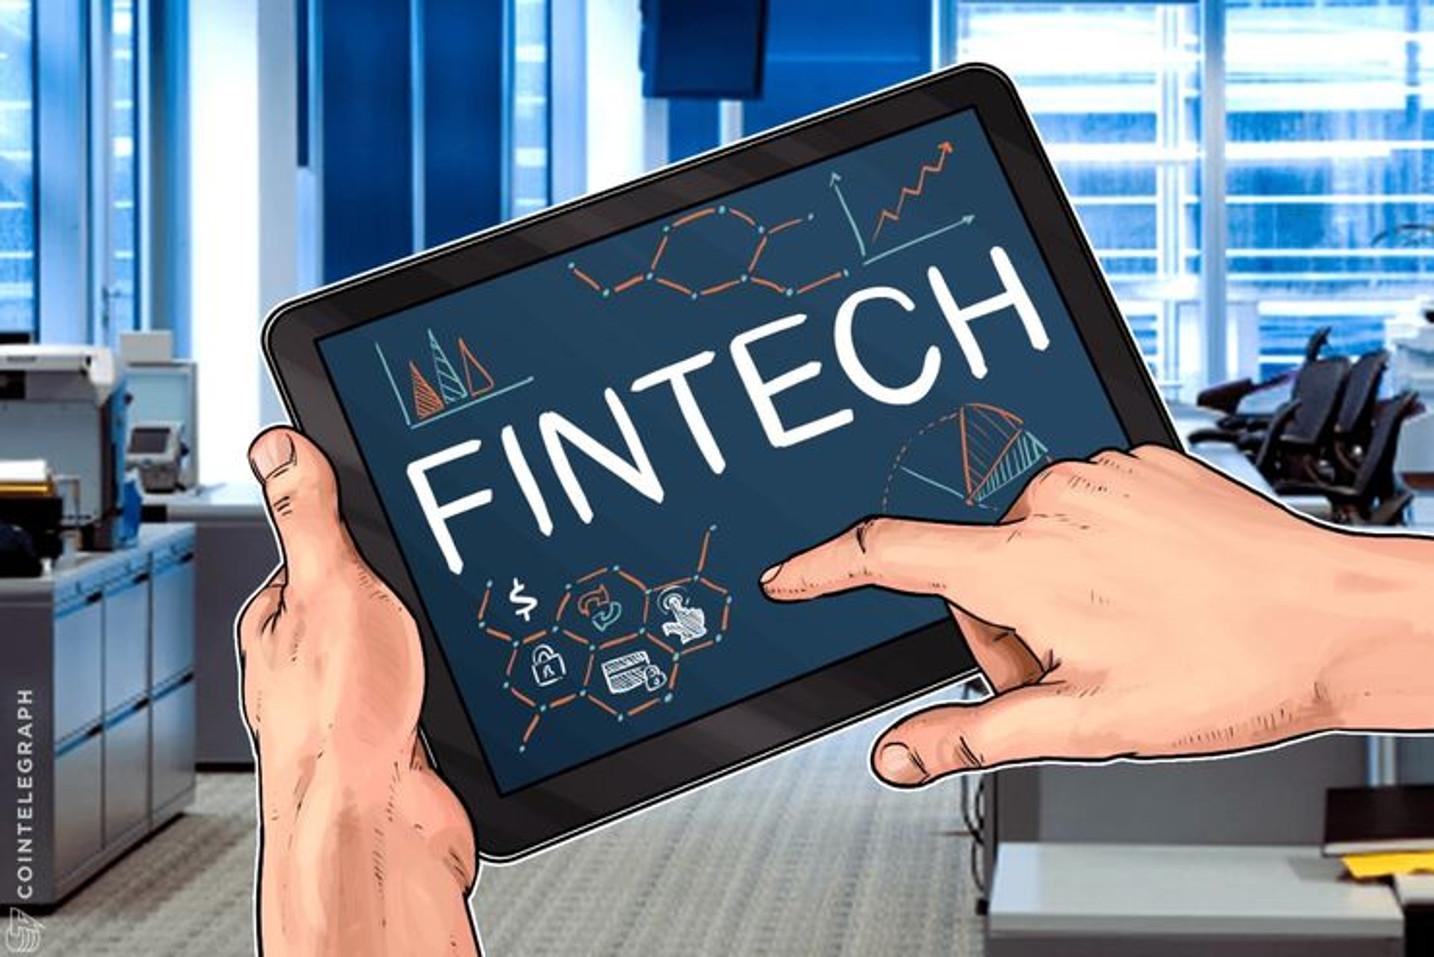 Minsait Payments obtiene certificación Visa ready para acelerar negocio de servicios a fintech